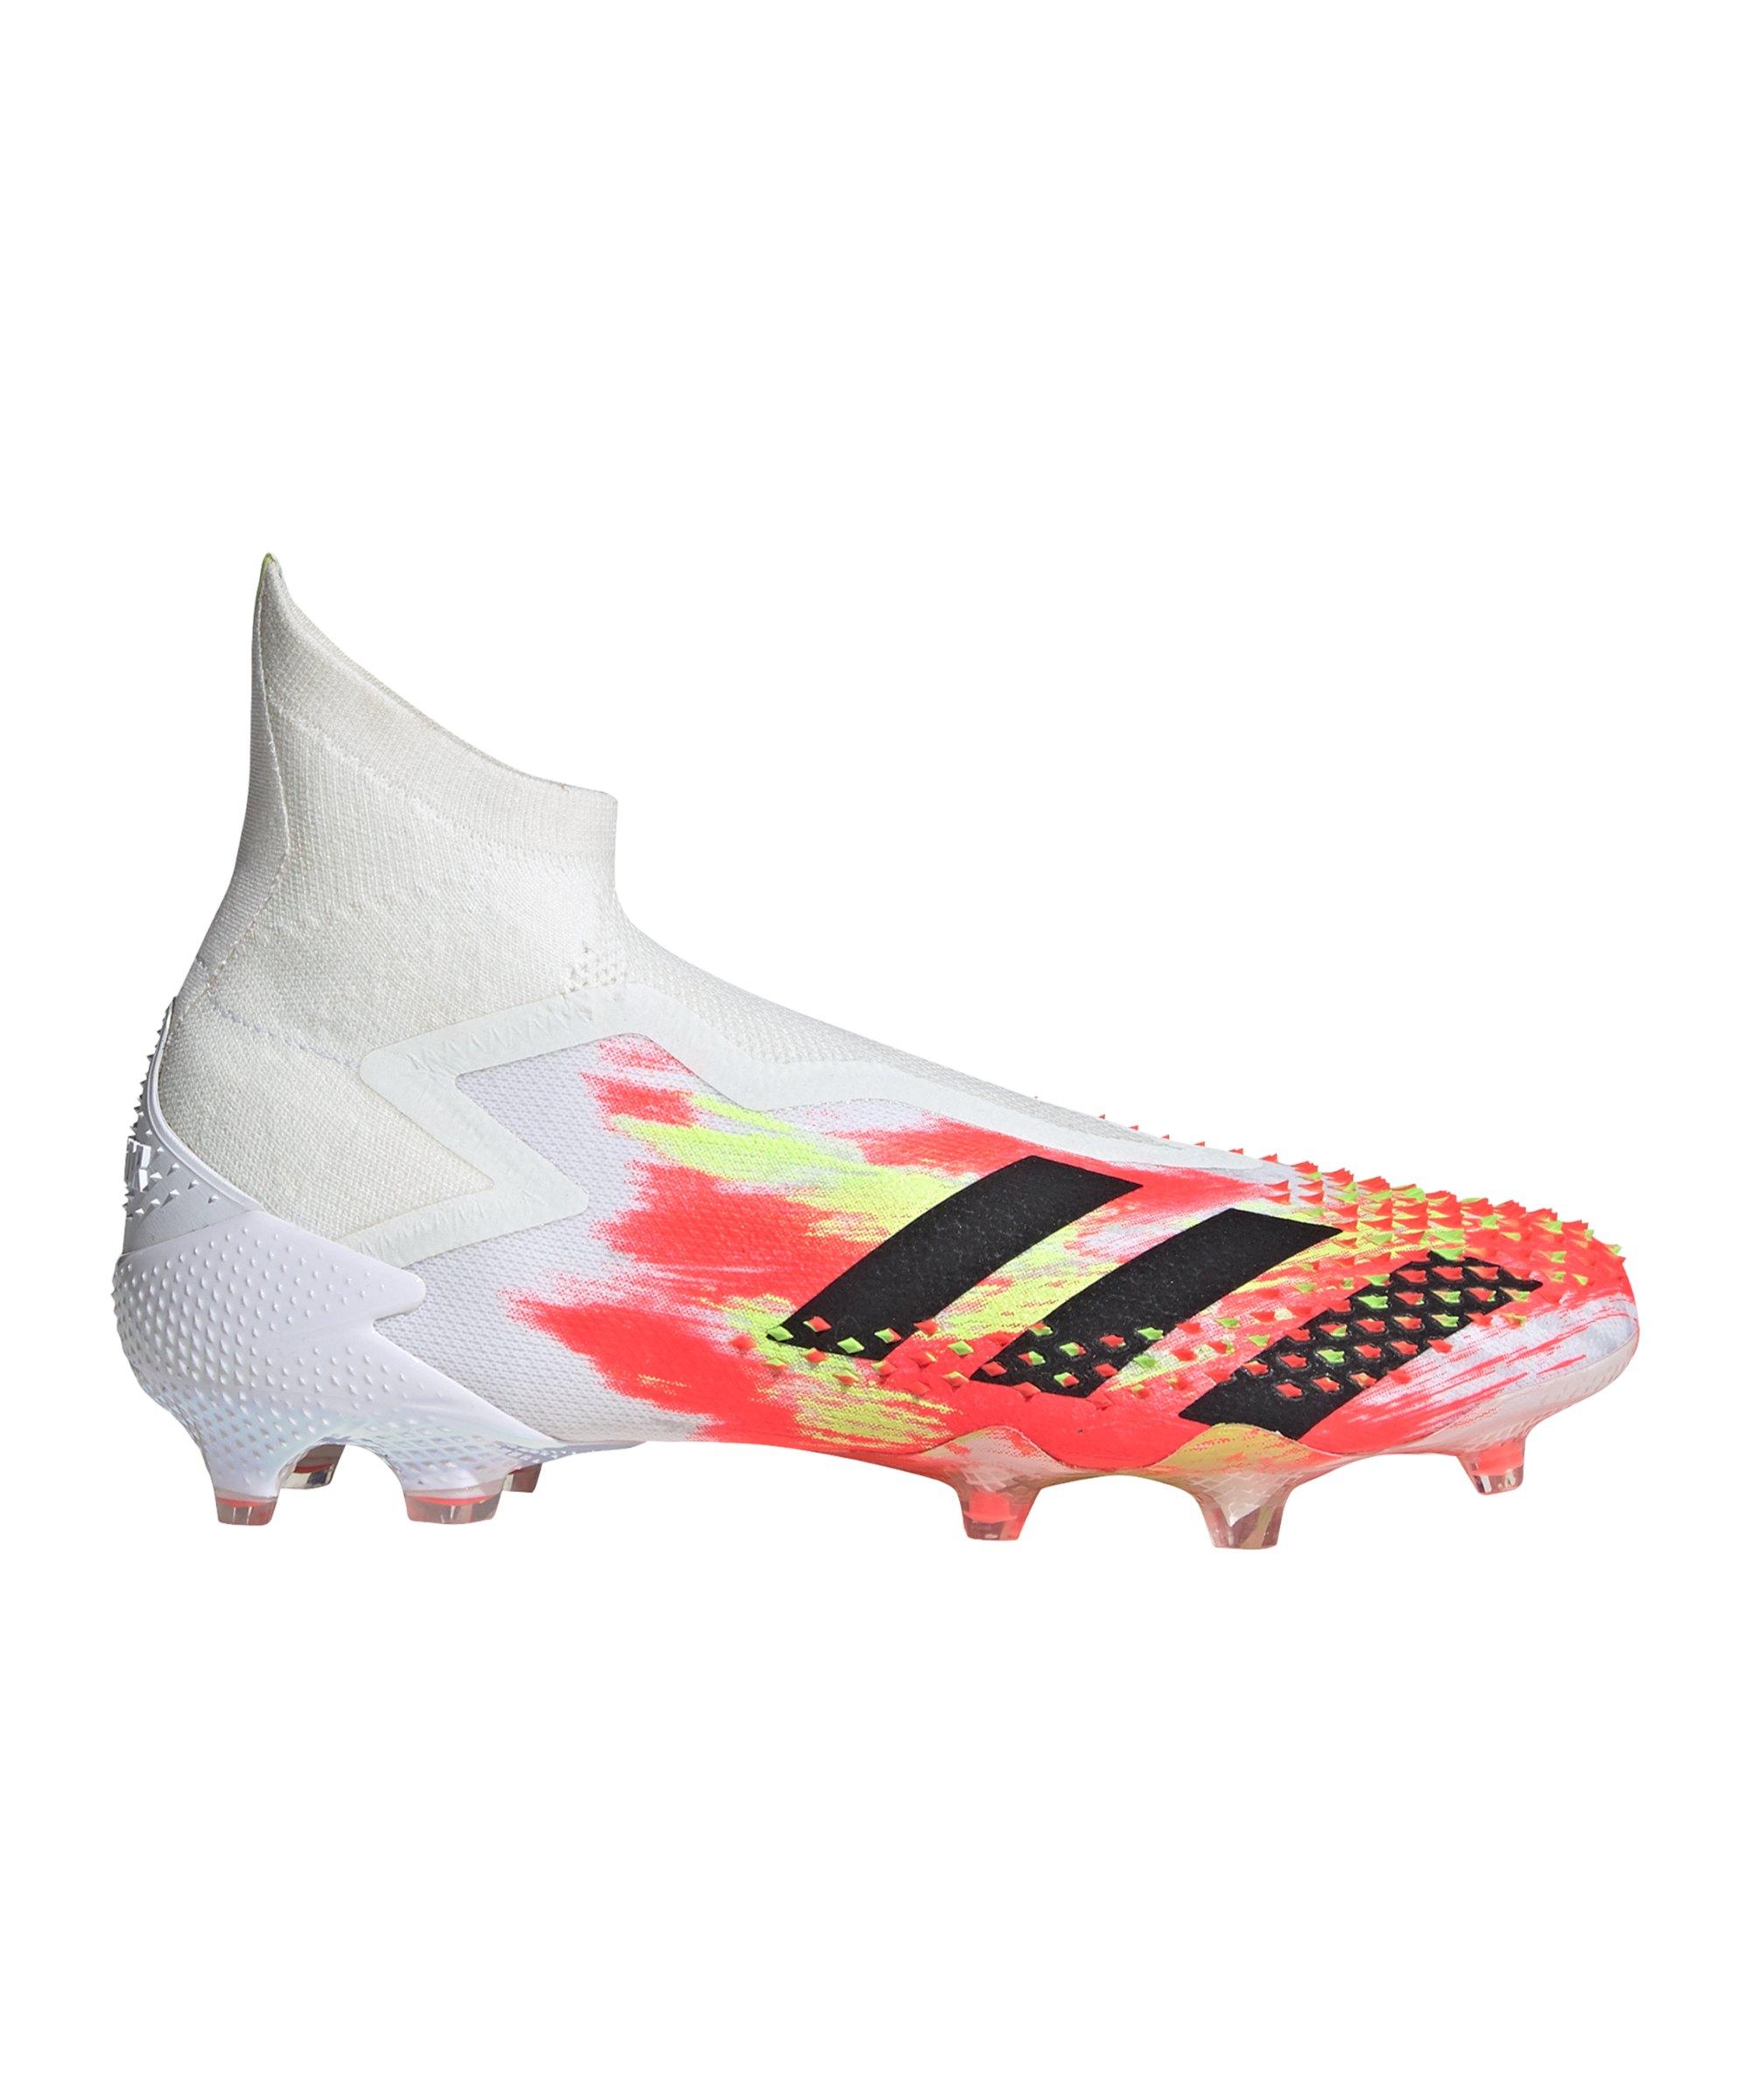 Adidas Predator Uniforia 20+ FG Weiss Rot Gelb